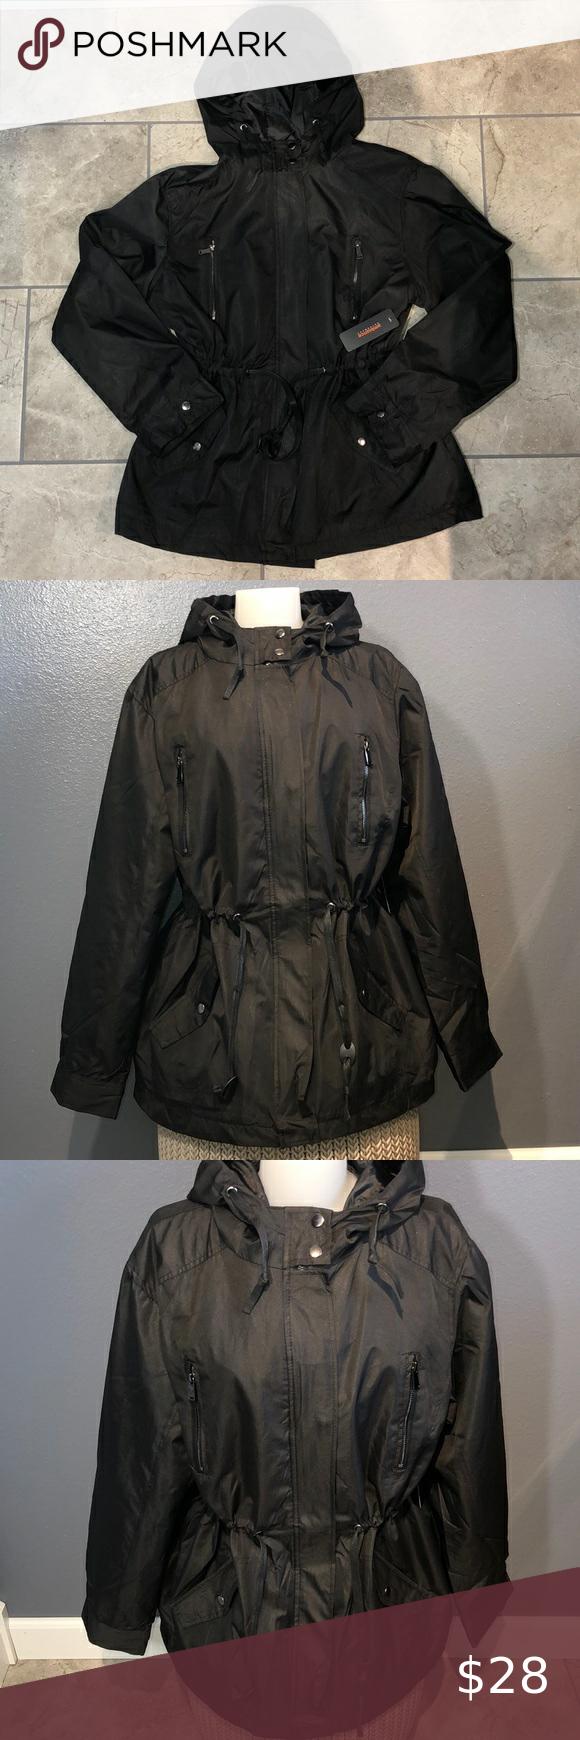 Ambiance Outerwear Jacket 2x Plus Size Outerwear Jackets Jackets Outerwear [ 1740 x 580 Pixel ]